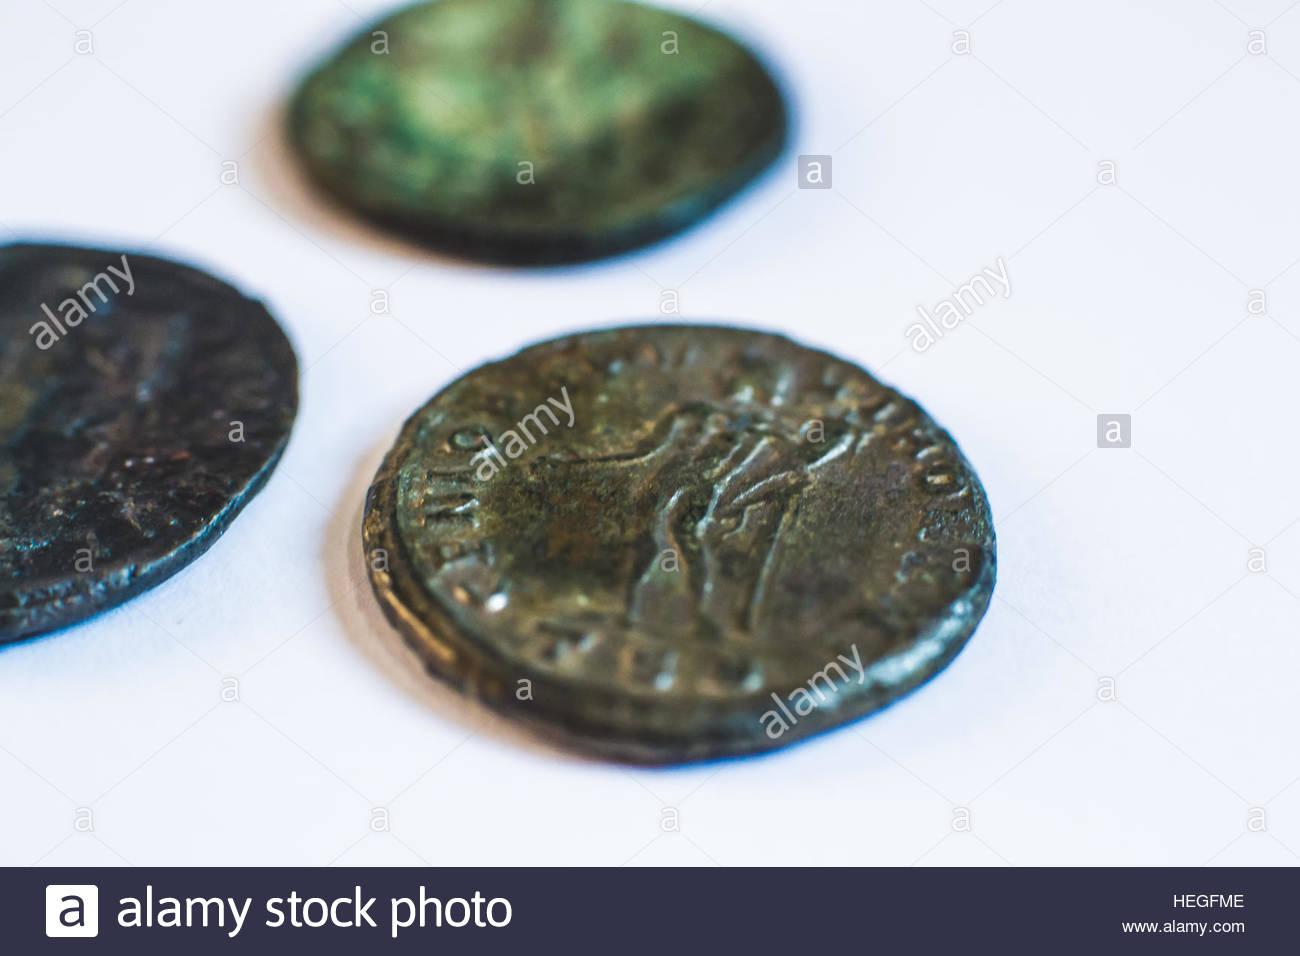 Roman coins  Old coins  Rare  Historical Stock Photo: 129441326 - Alamy